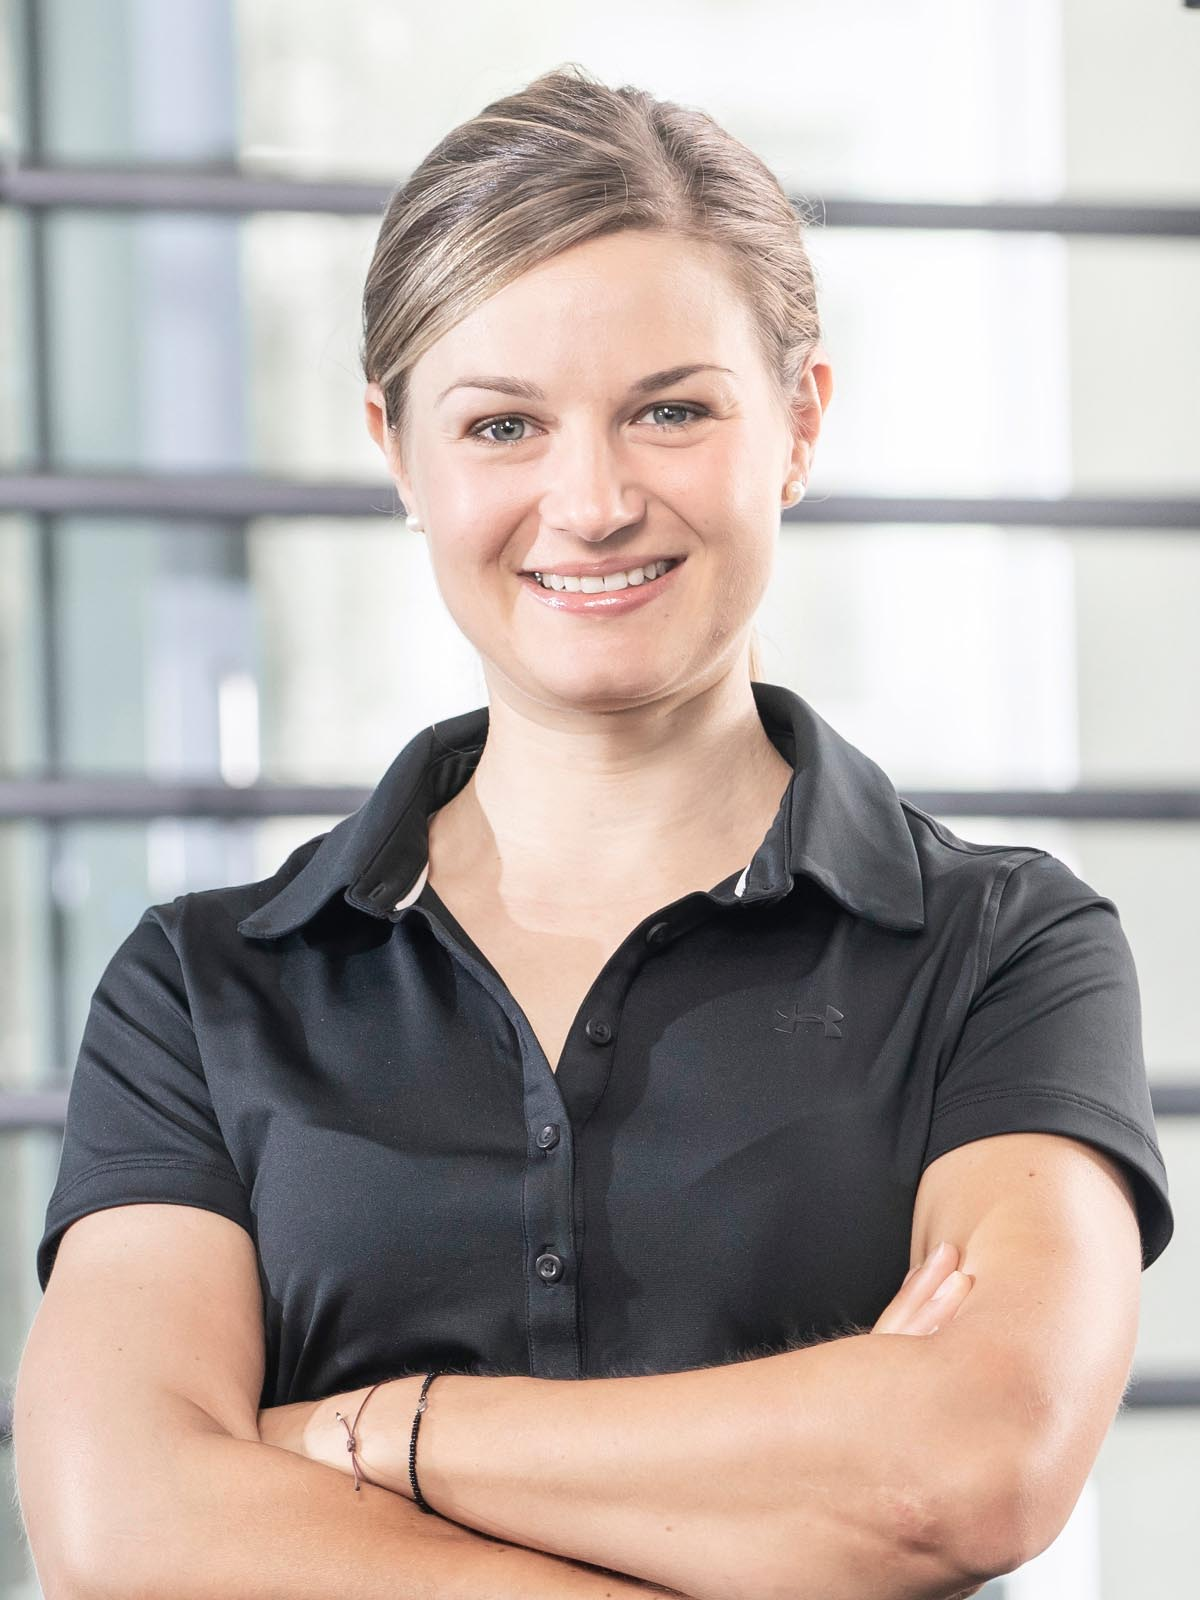 Veronika Weiss